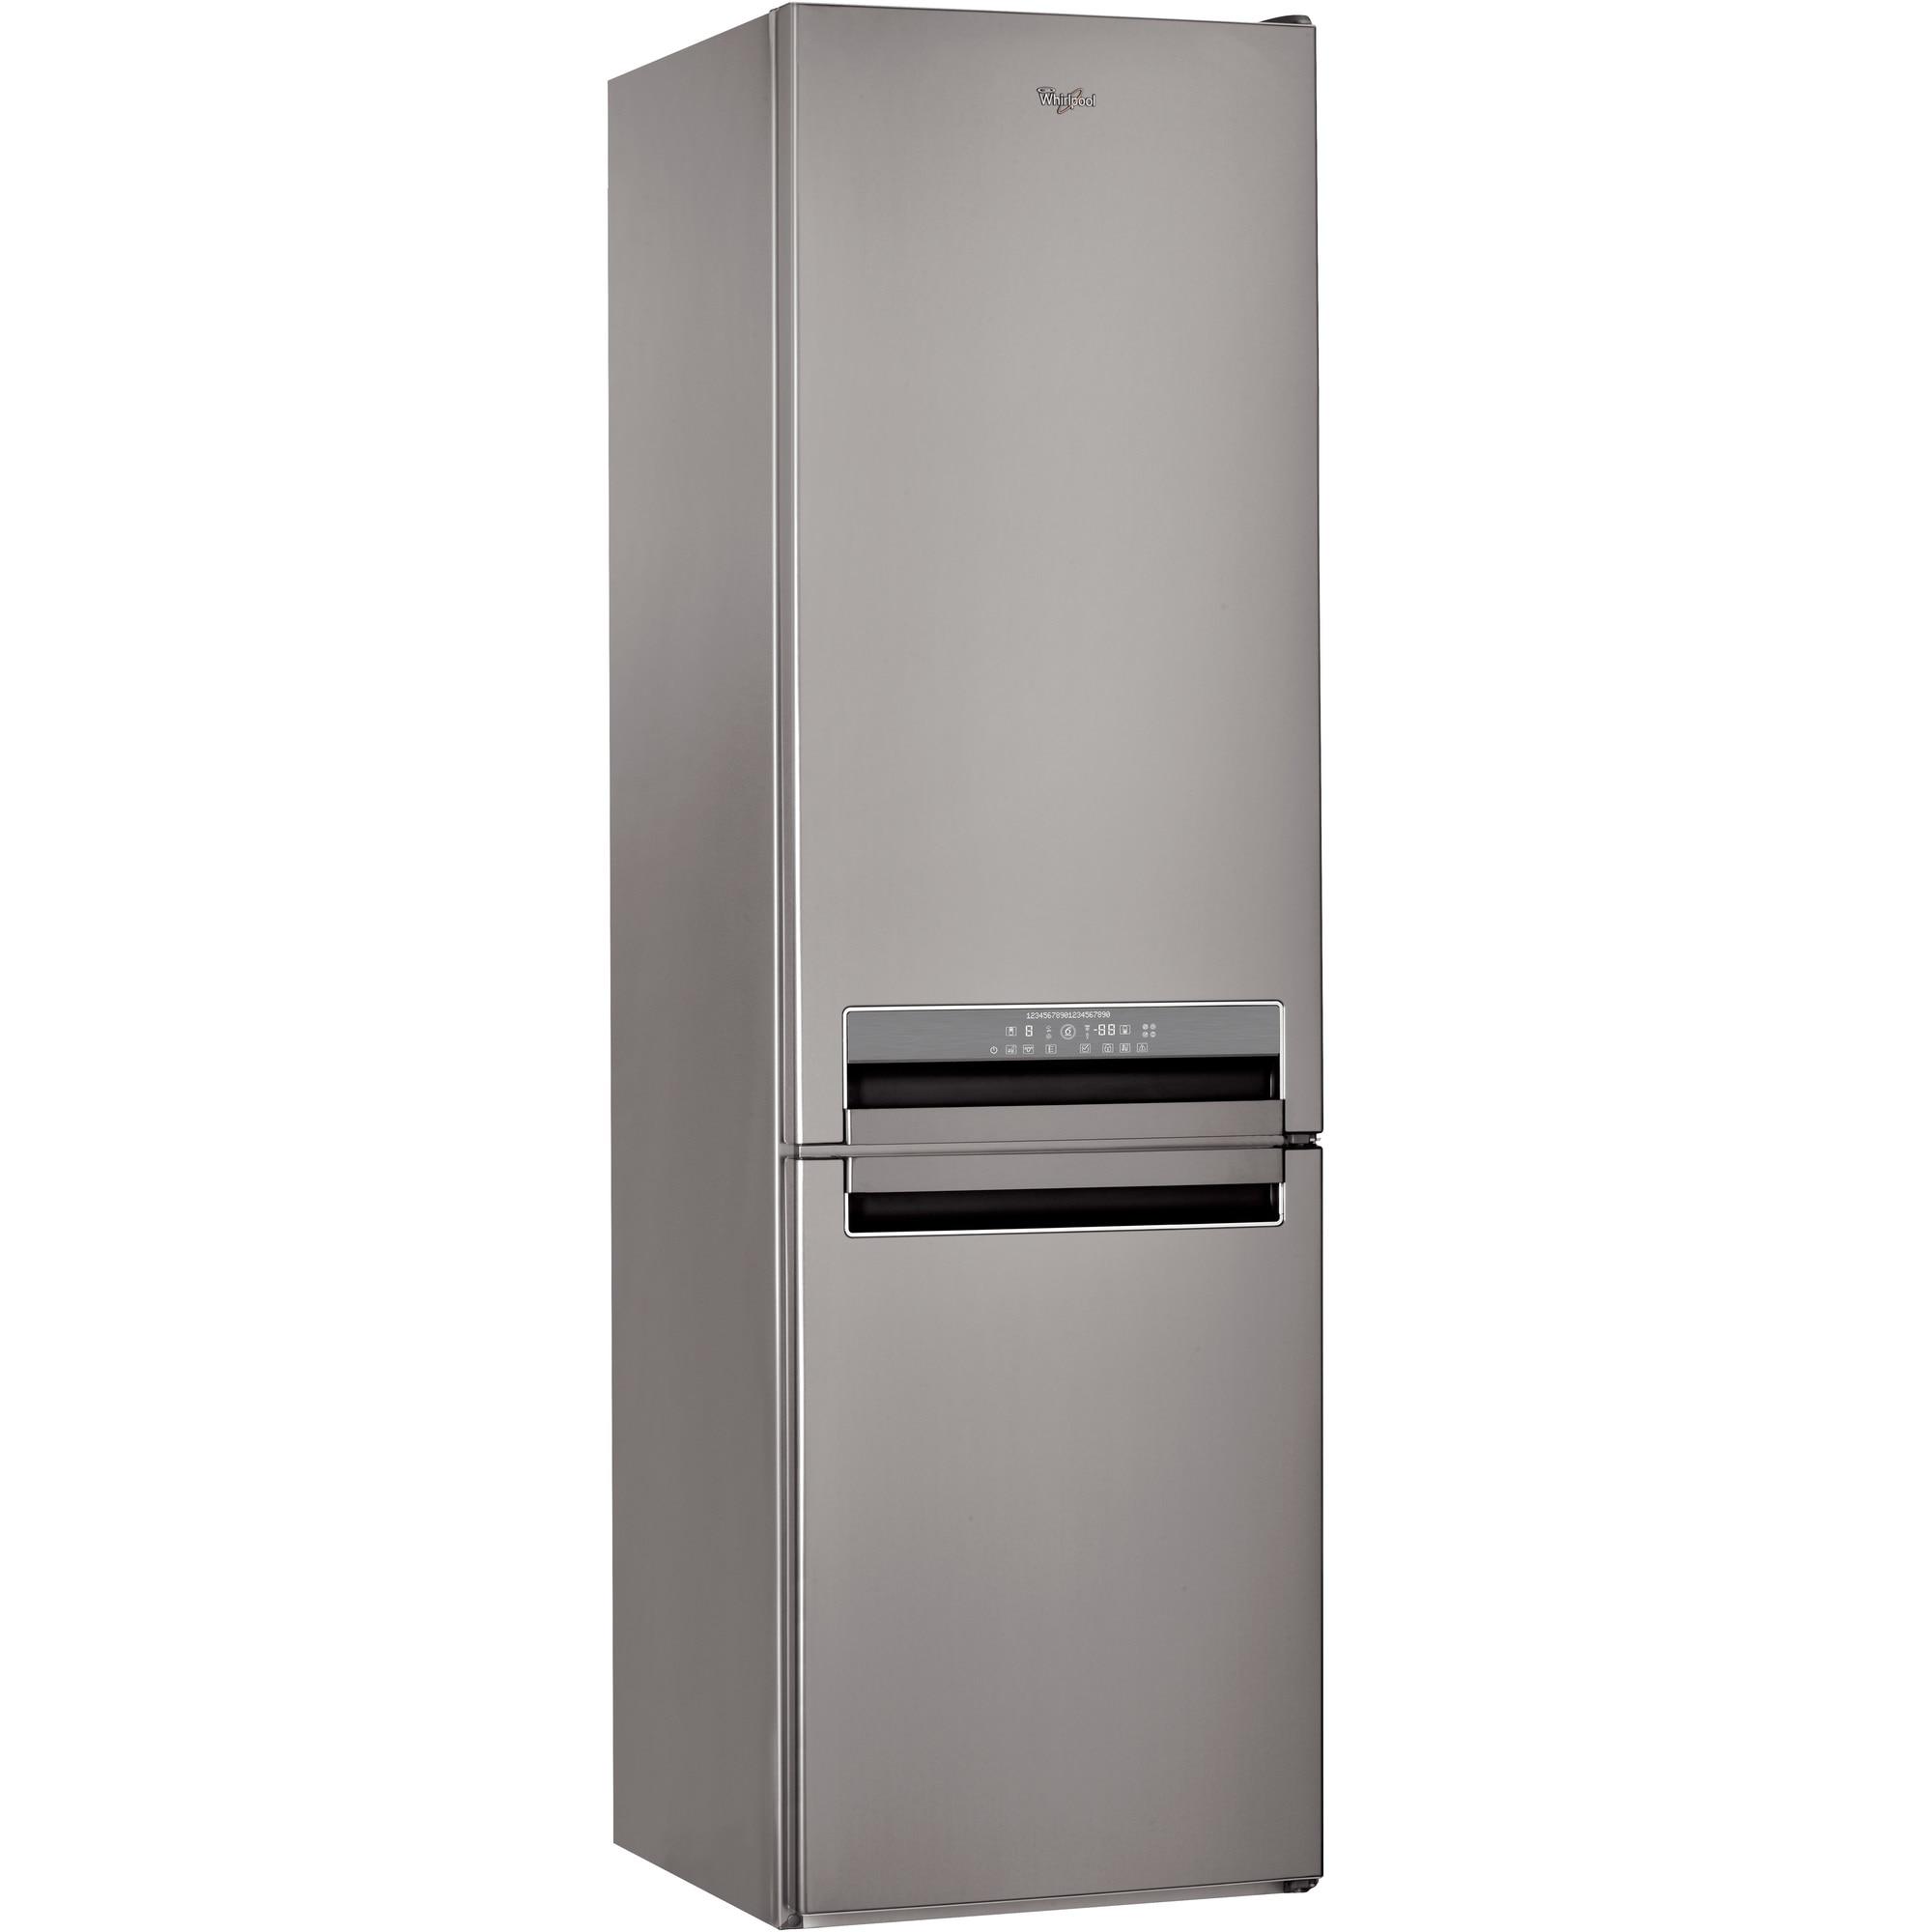 Fotografie Combina frigorifica Whirlpool BSNF 9782 OX, 339 l, Clasa A++, Full No Frost, 6th Sense, H 201 cm, Inox